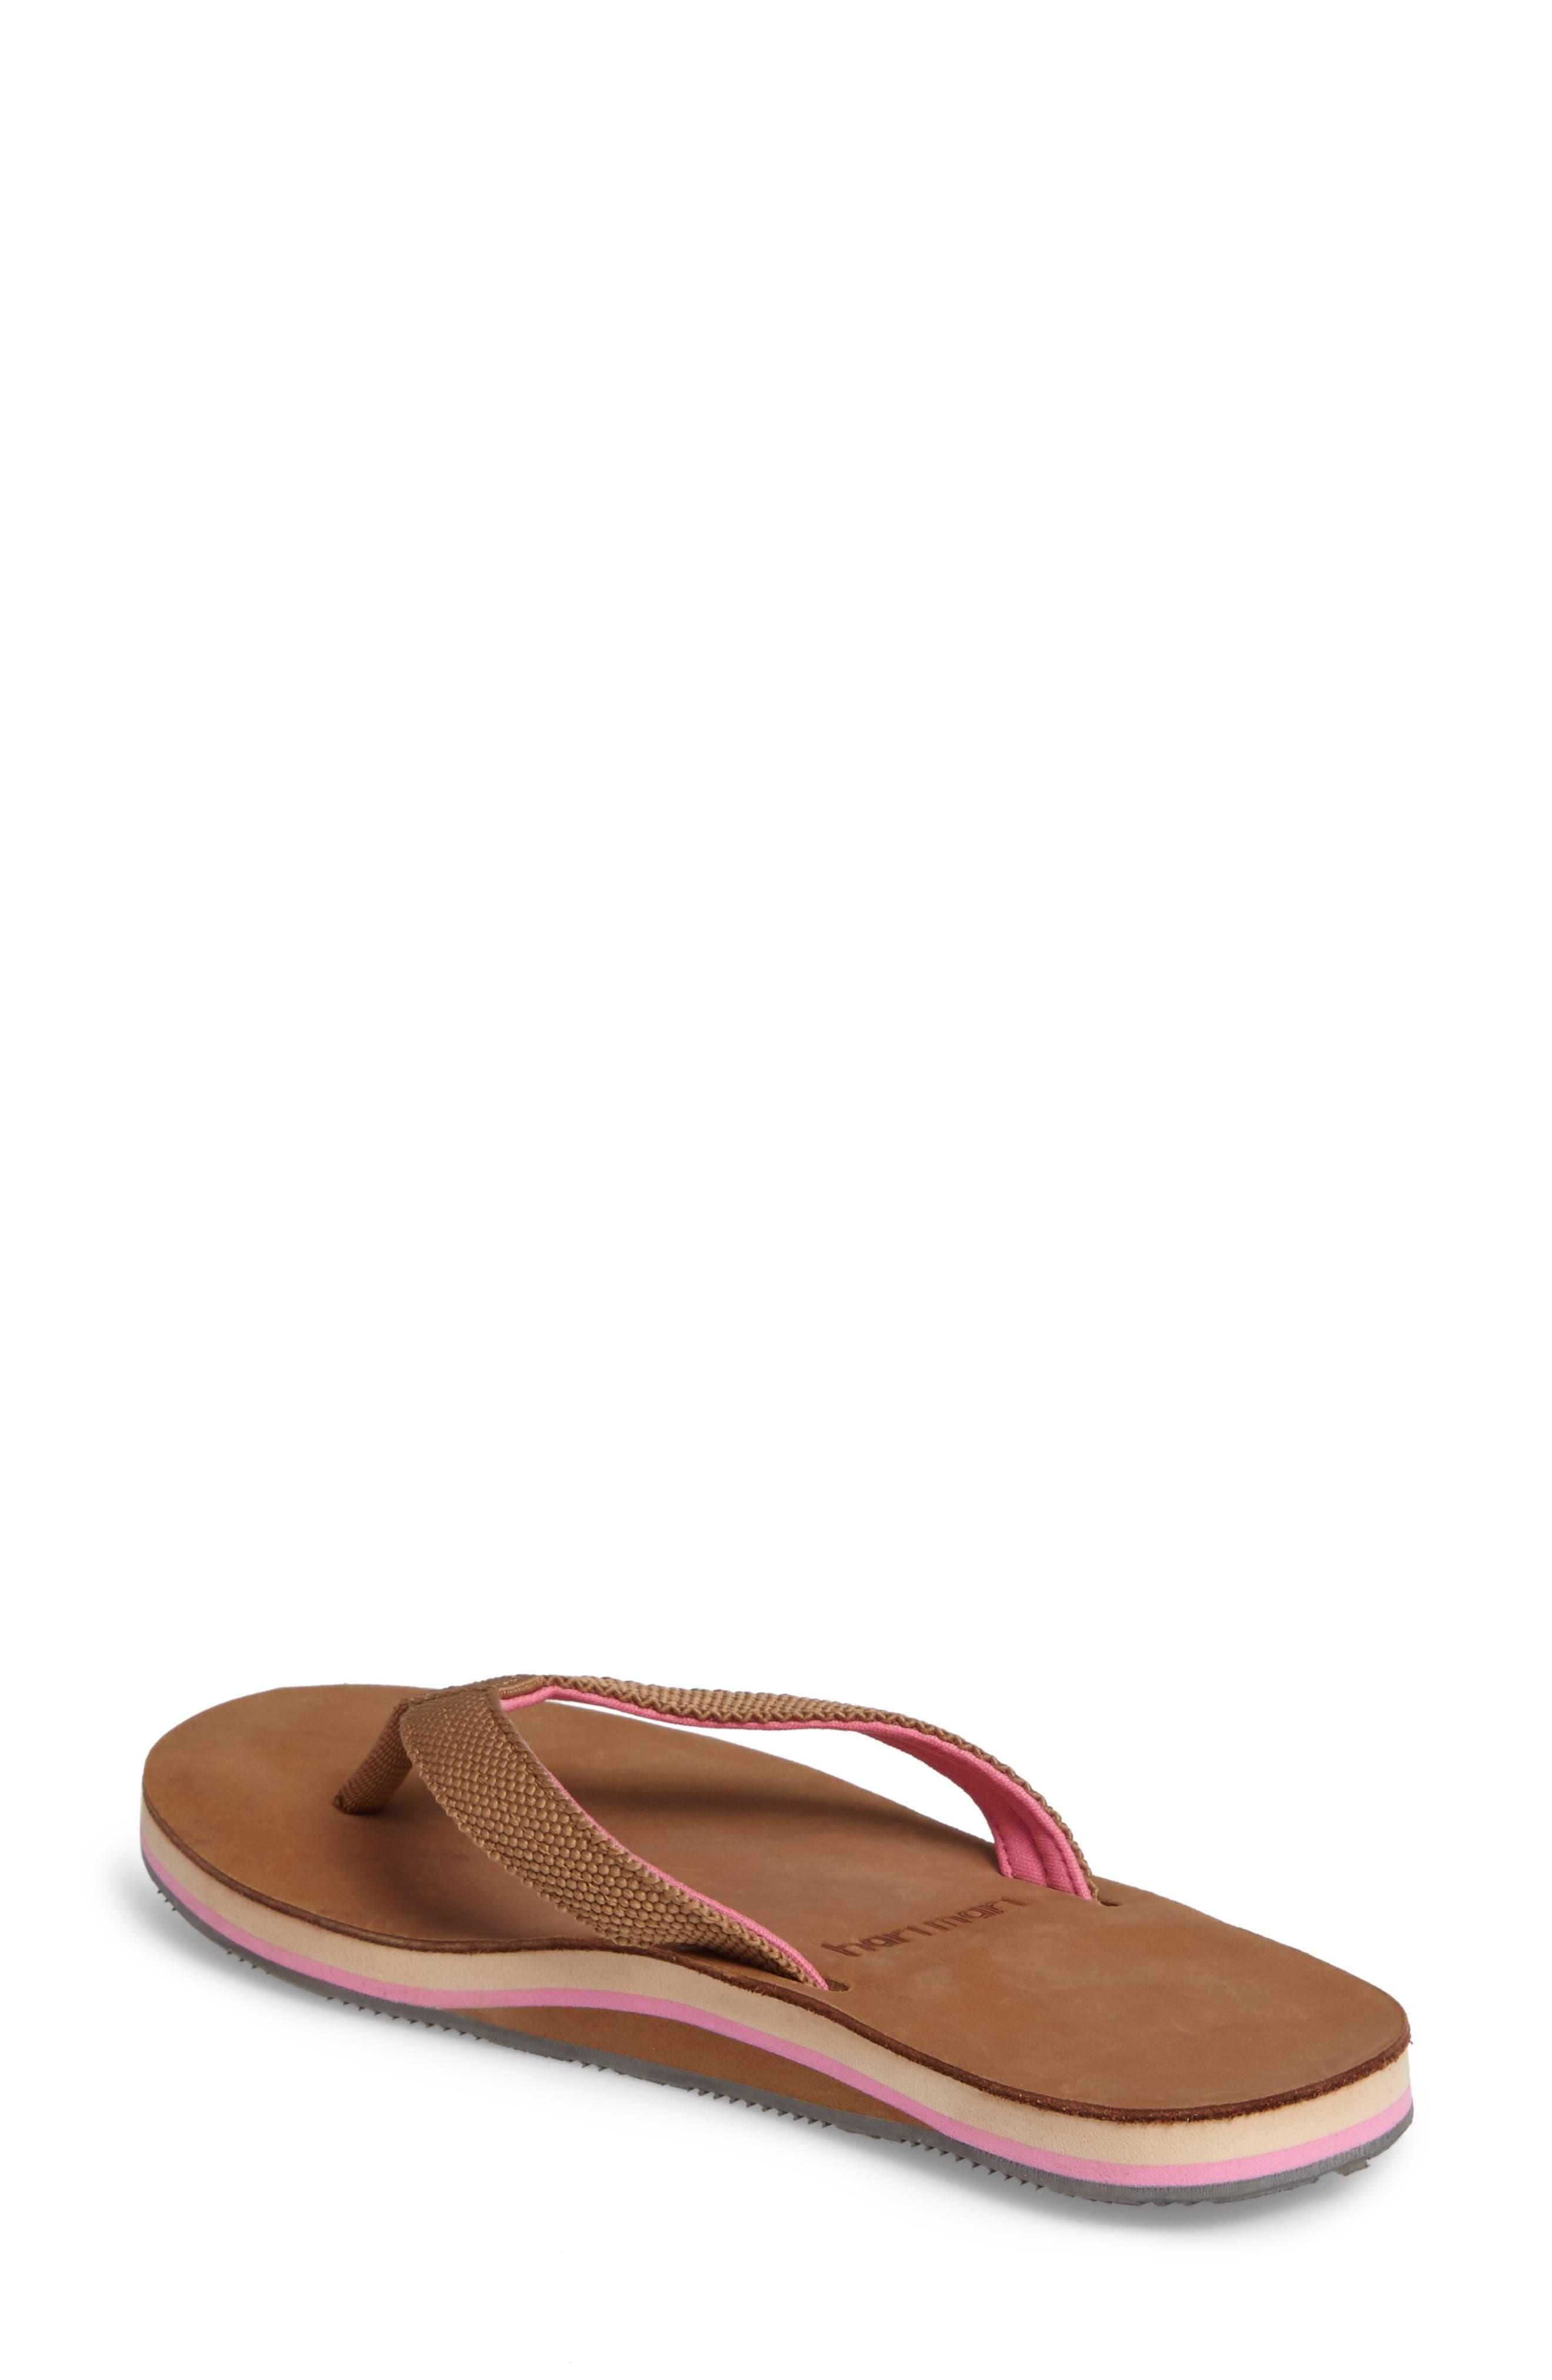 Scouts Flip Flop,                             Alternate thumbnail 2, color,                             Tan/ Shell Pink